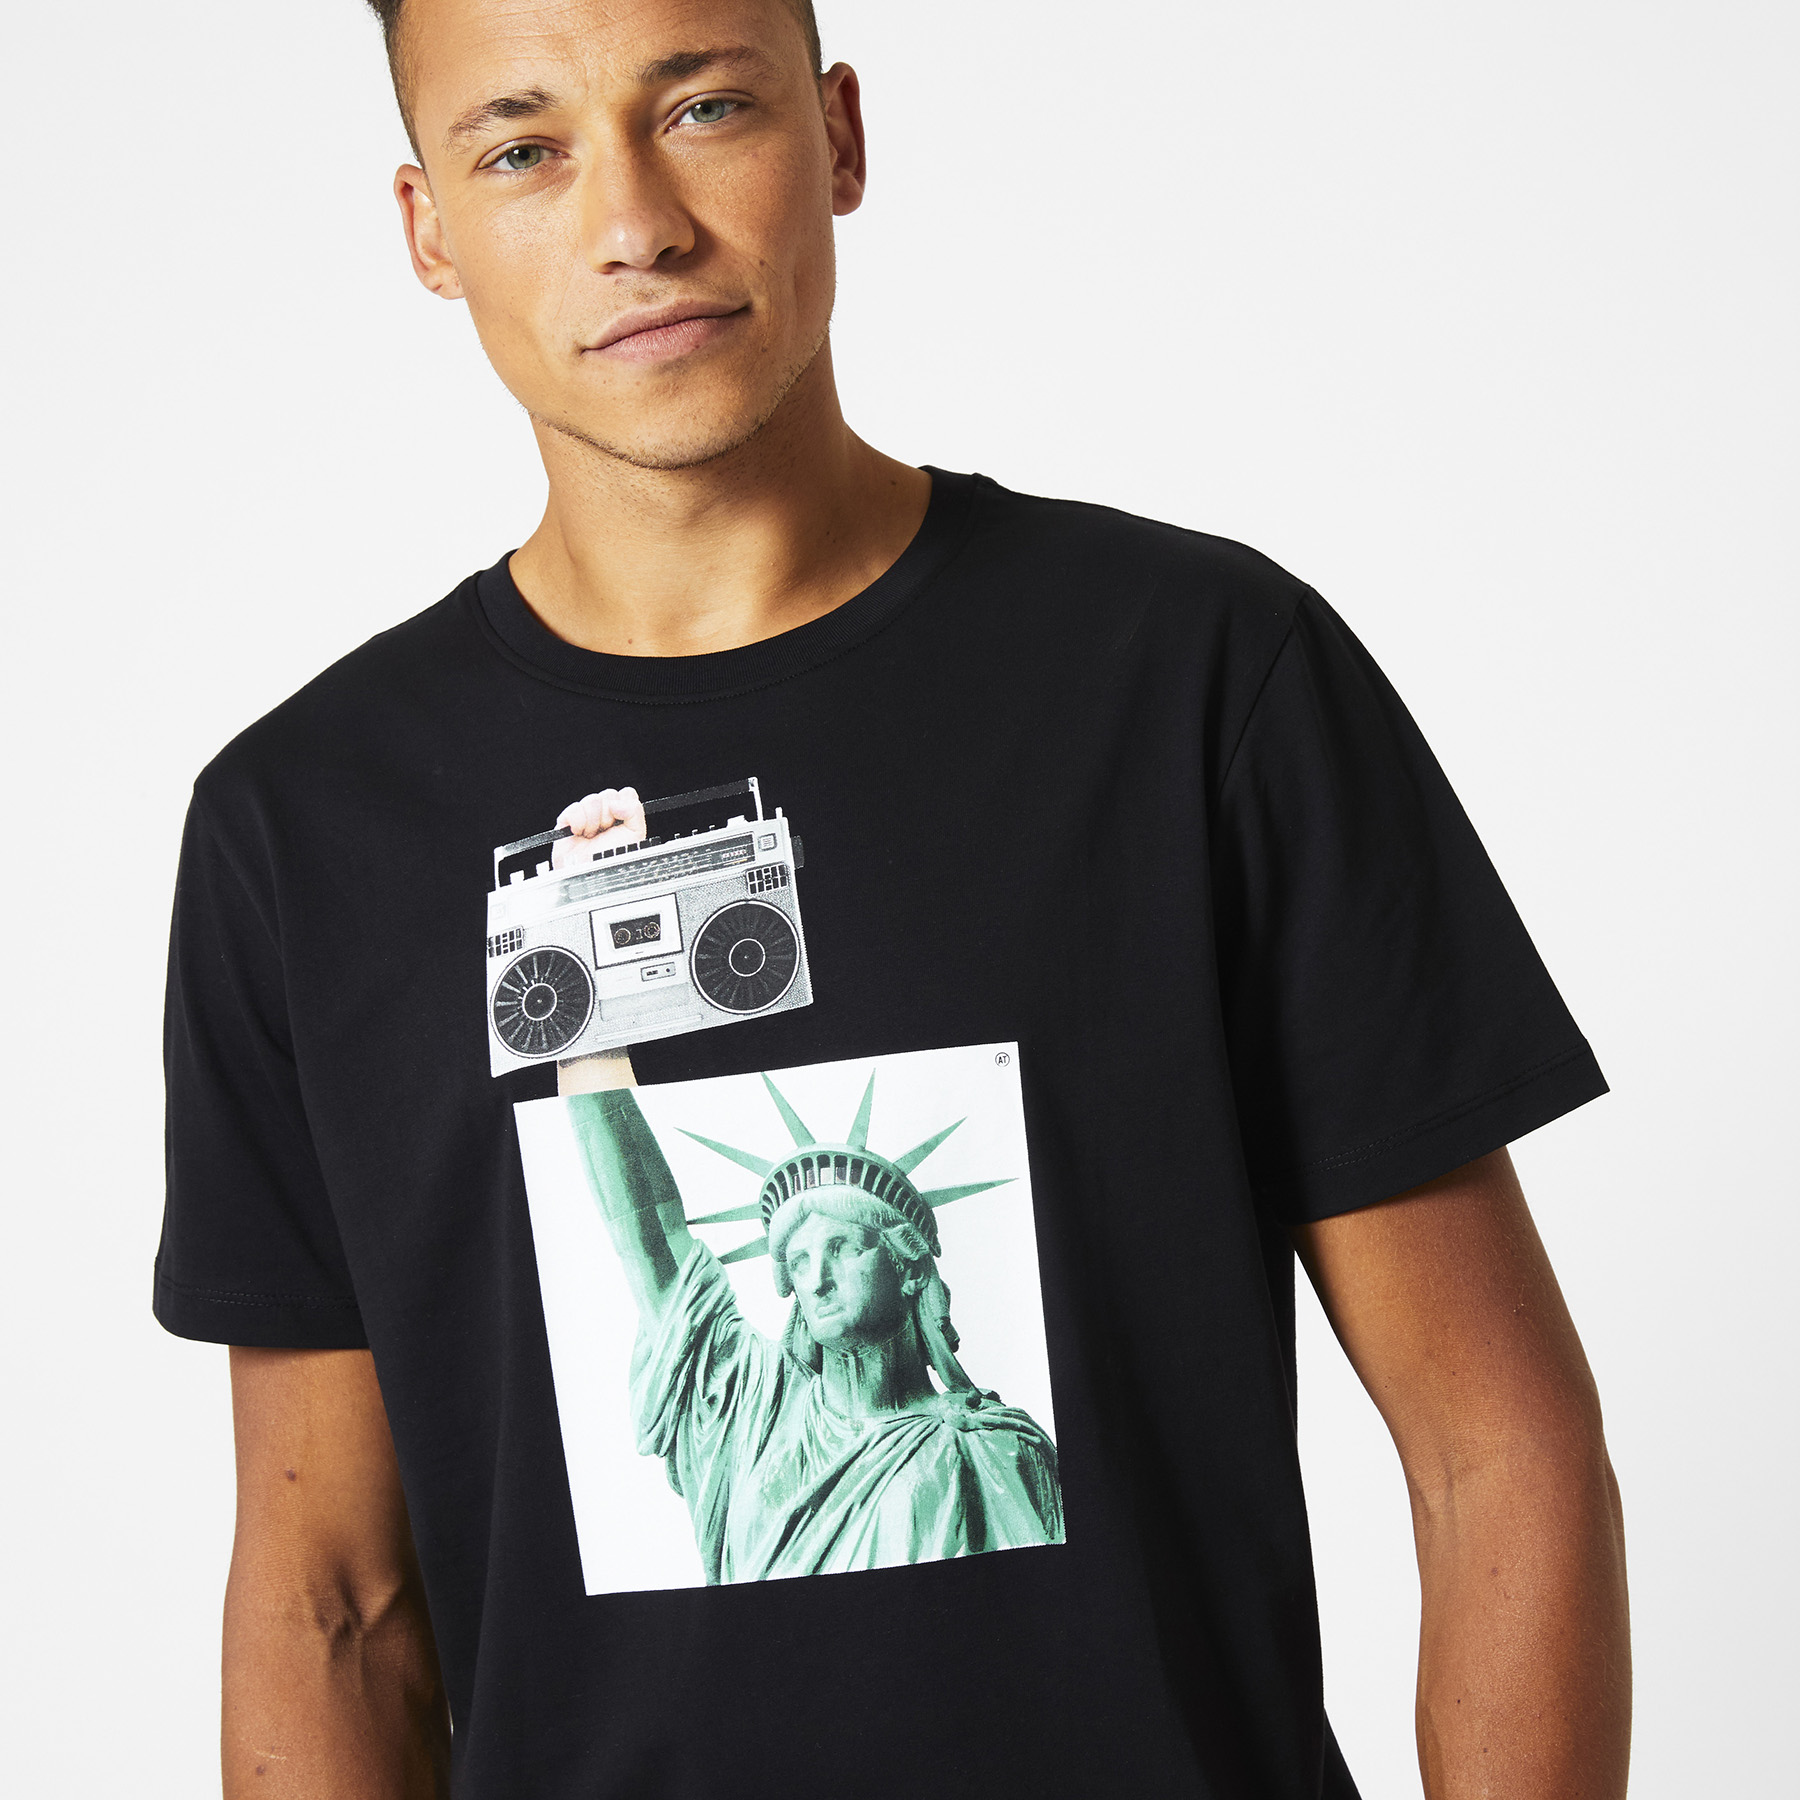 T-shirt Ed collage